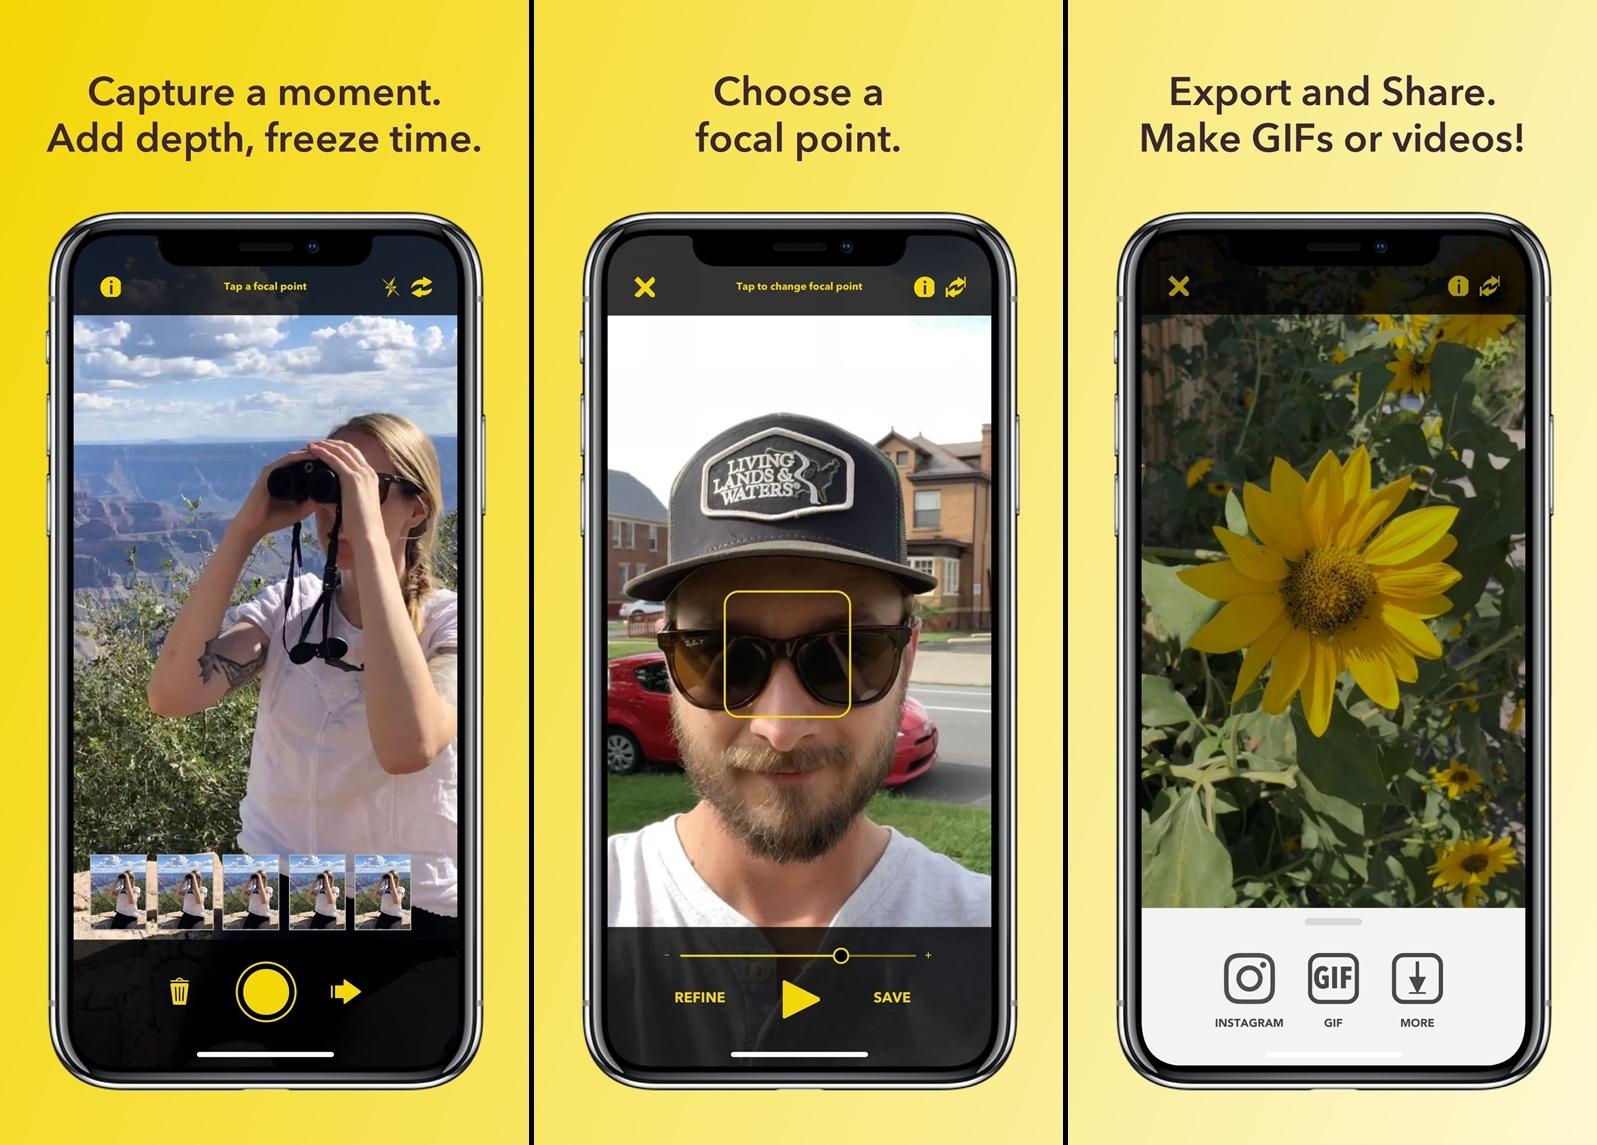 FourEyes - التطبيق المميز الجديد FourEyes لإنشاء صور ثلاثية الأبعاد لهواتف الآيفون